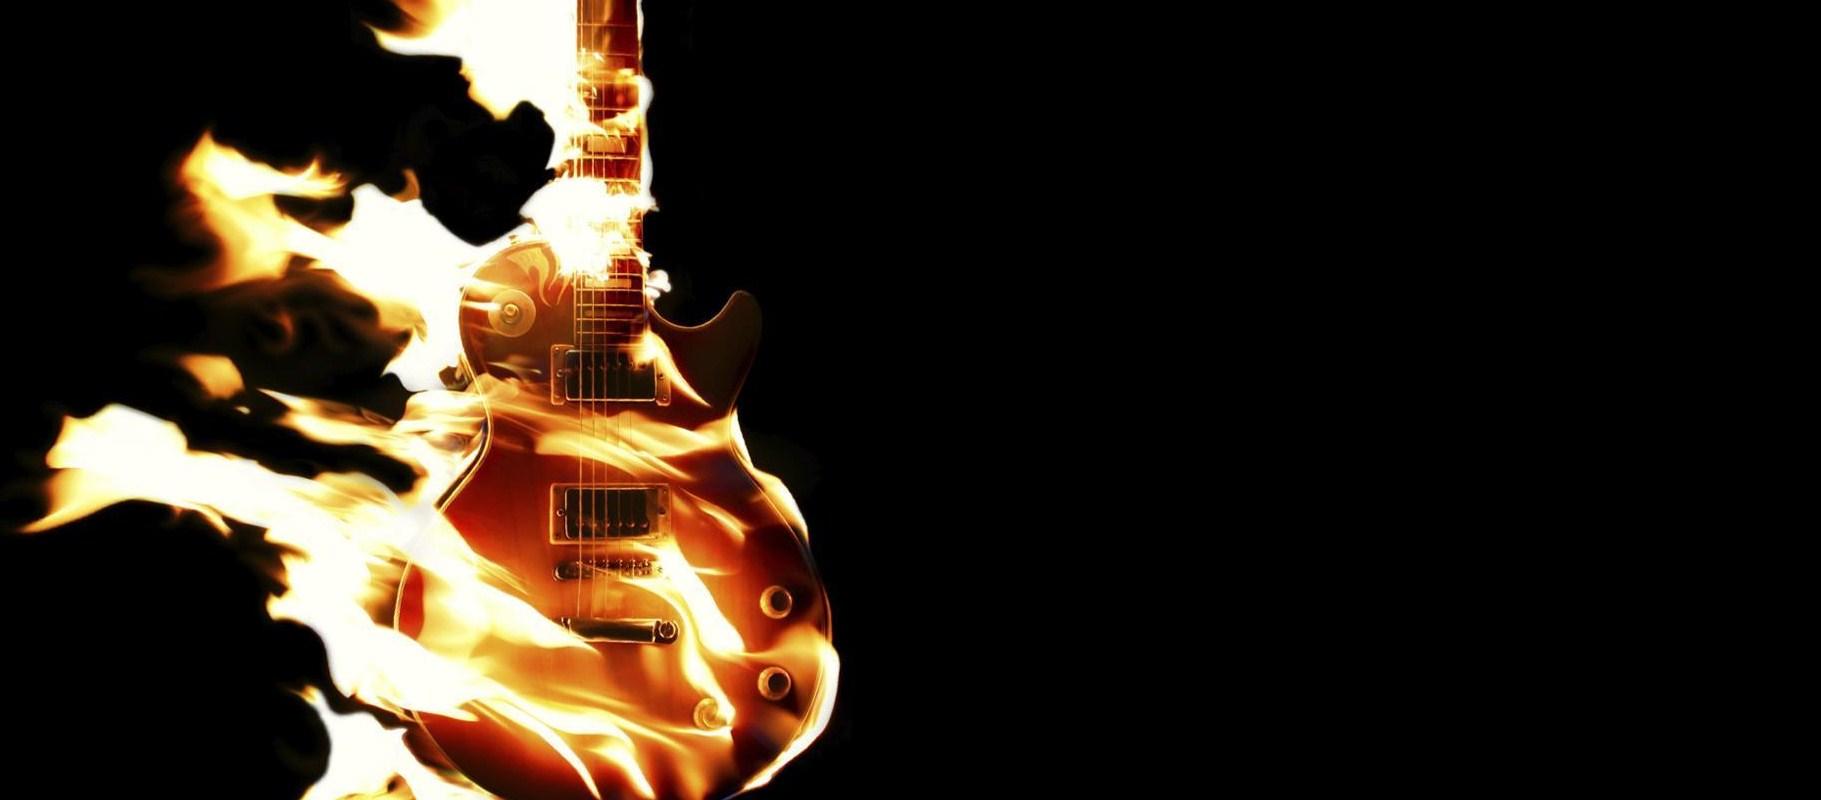 Guitar-guitar-10565741-1920-1200 – Copia